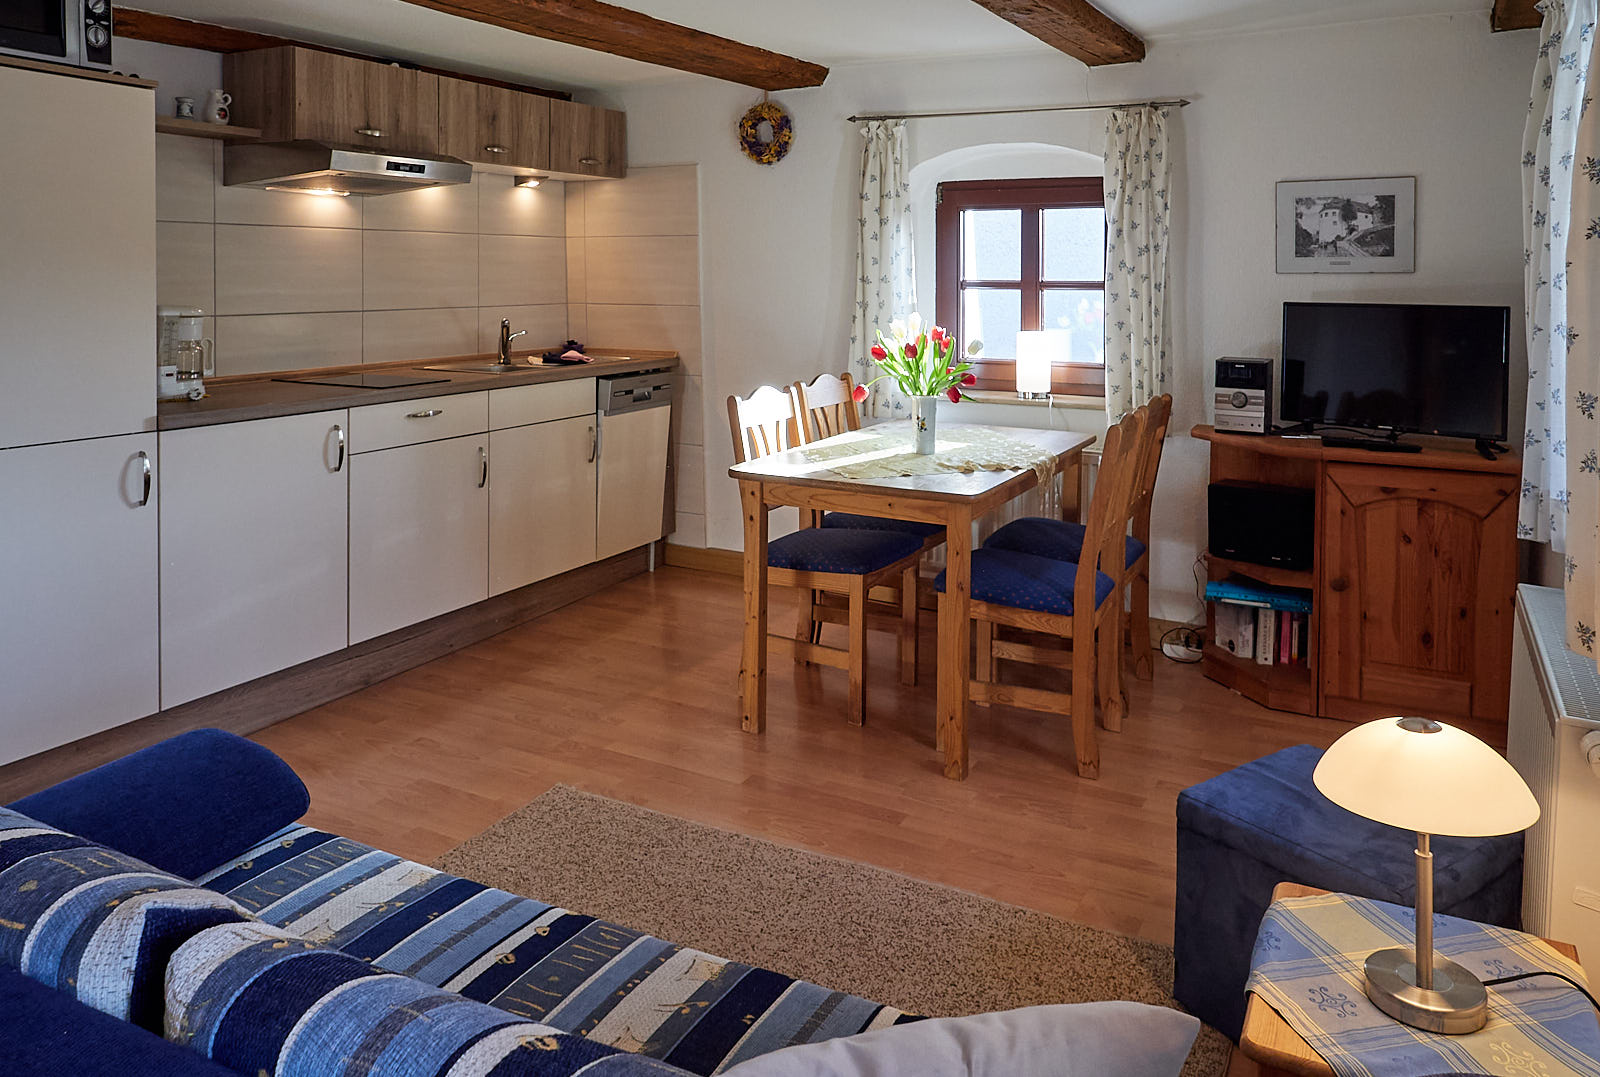 Wohnküche mit 3. Bett & TV